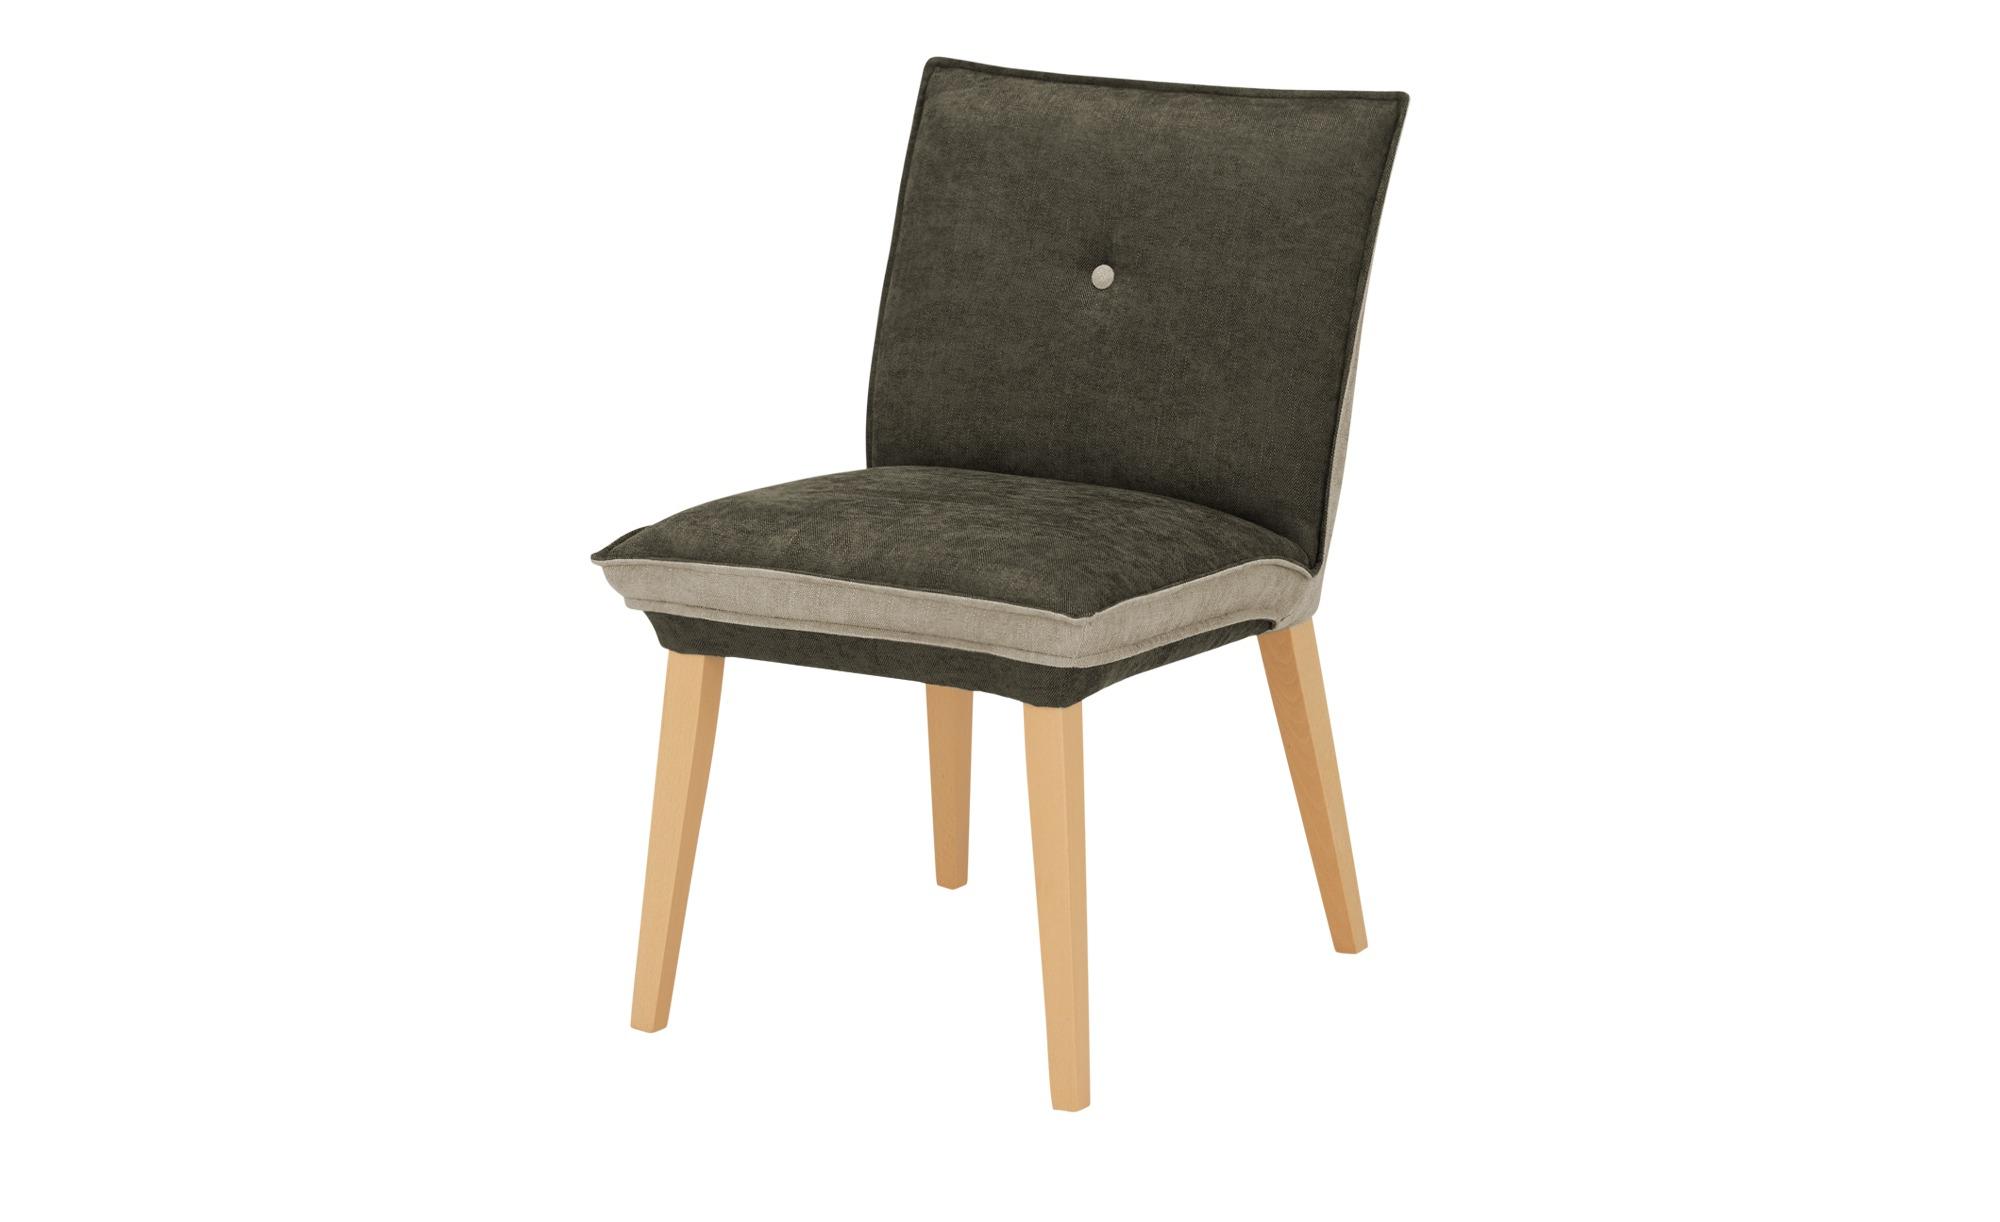 Woodford Polsterstuhl Sunna grau 52 cm 87 cm 65 cm Stühle > Esszimmerstühle Möbel Kraft